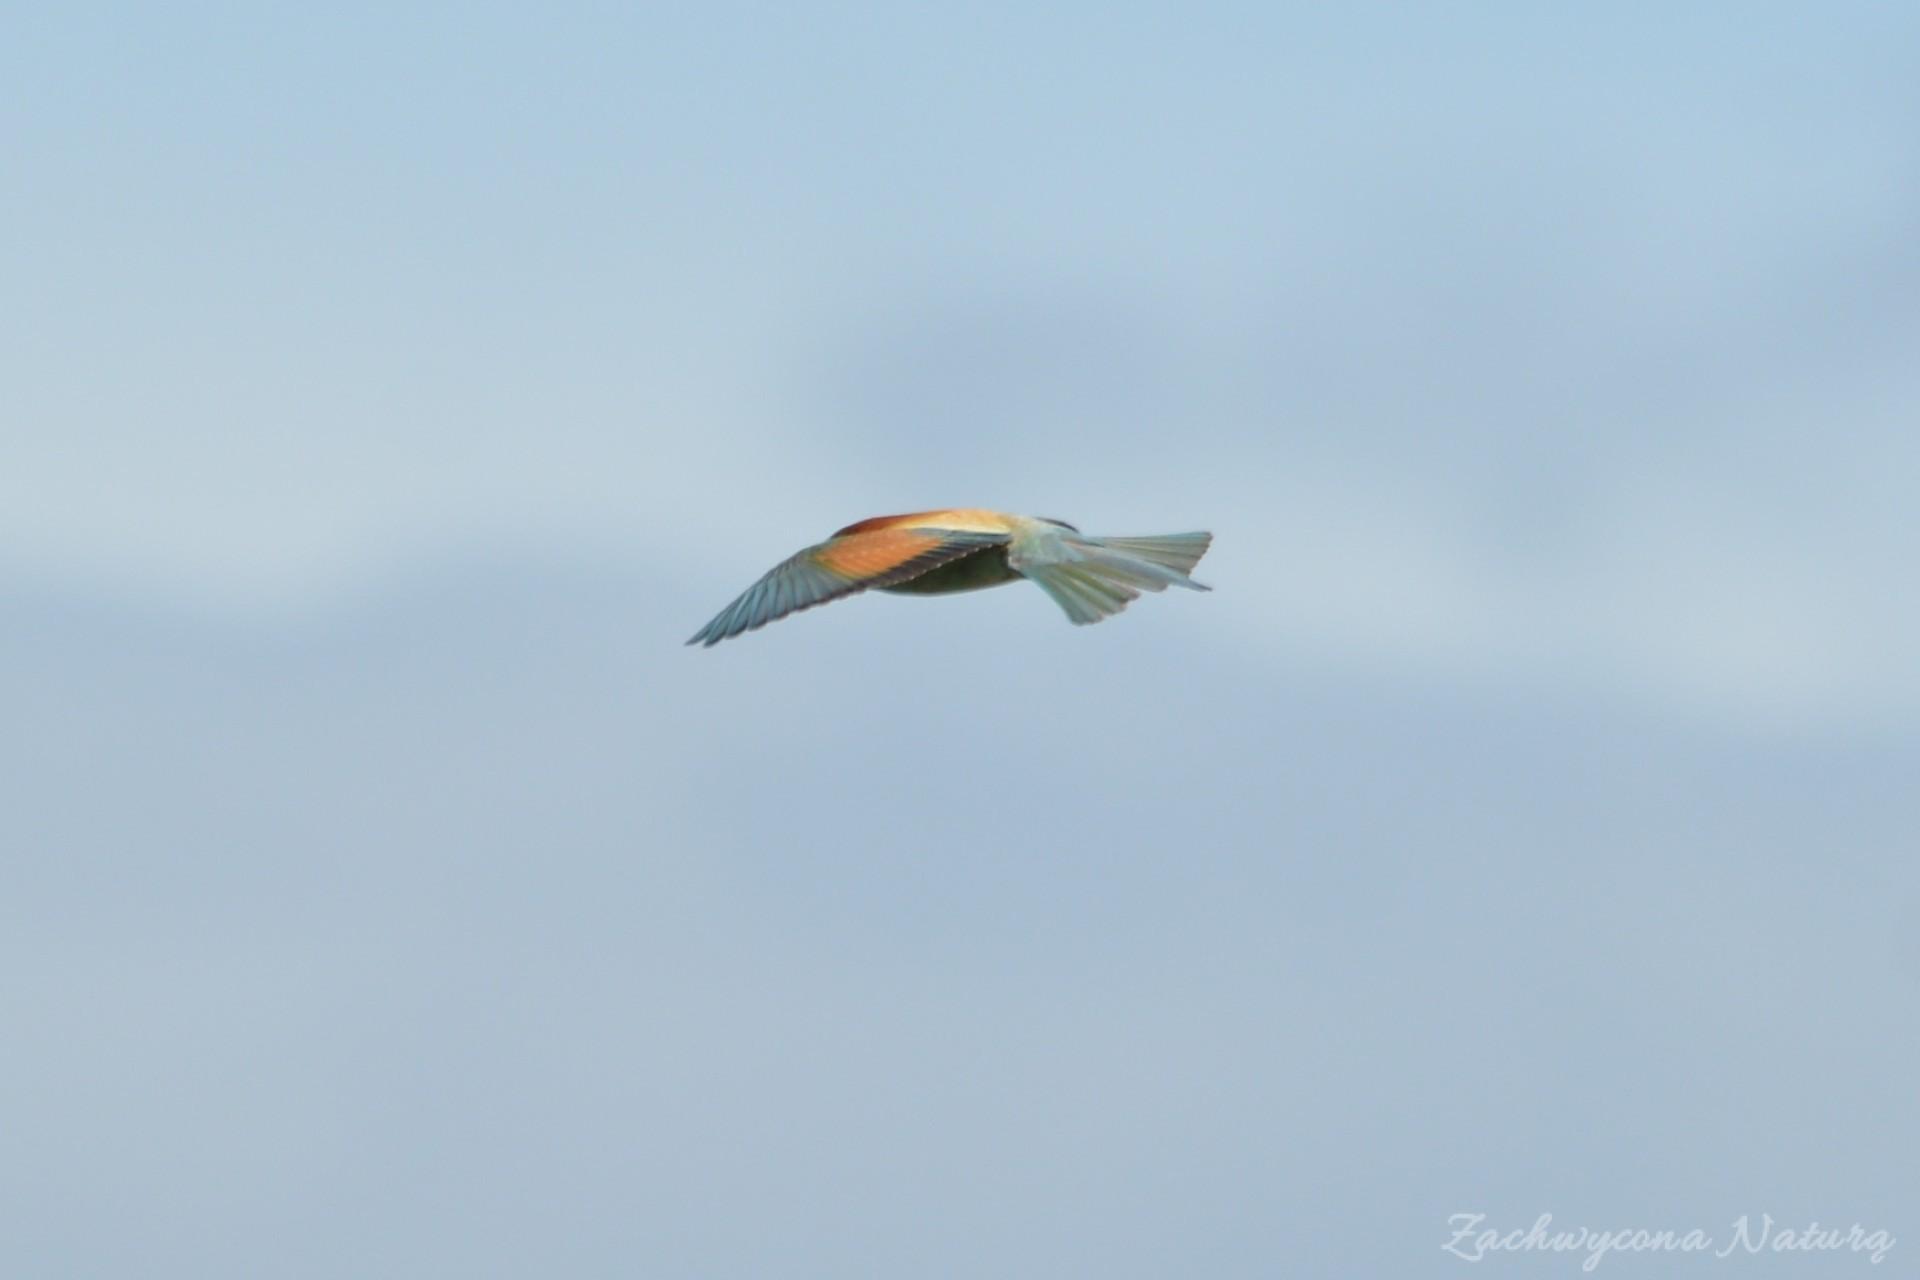 zolna-kolorowa-jak-papuga-merops-apiaster-bee-eater-12